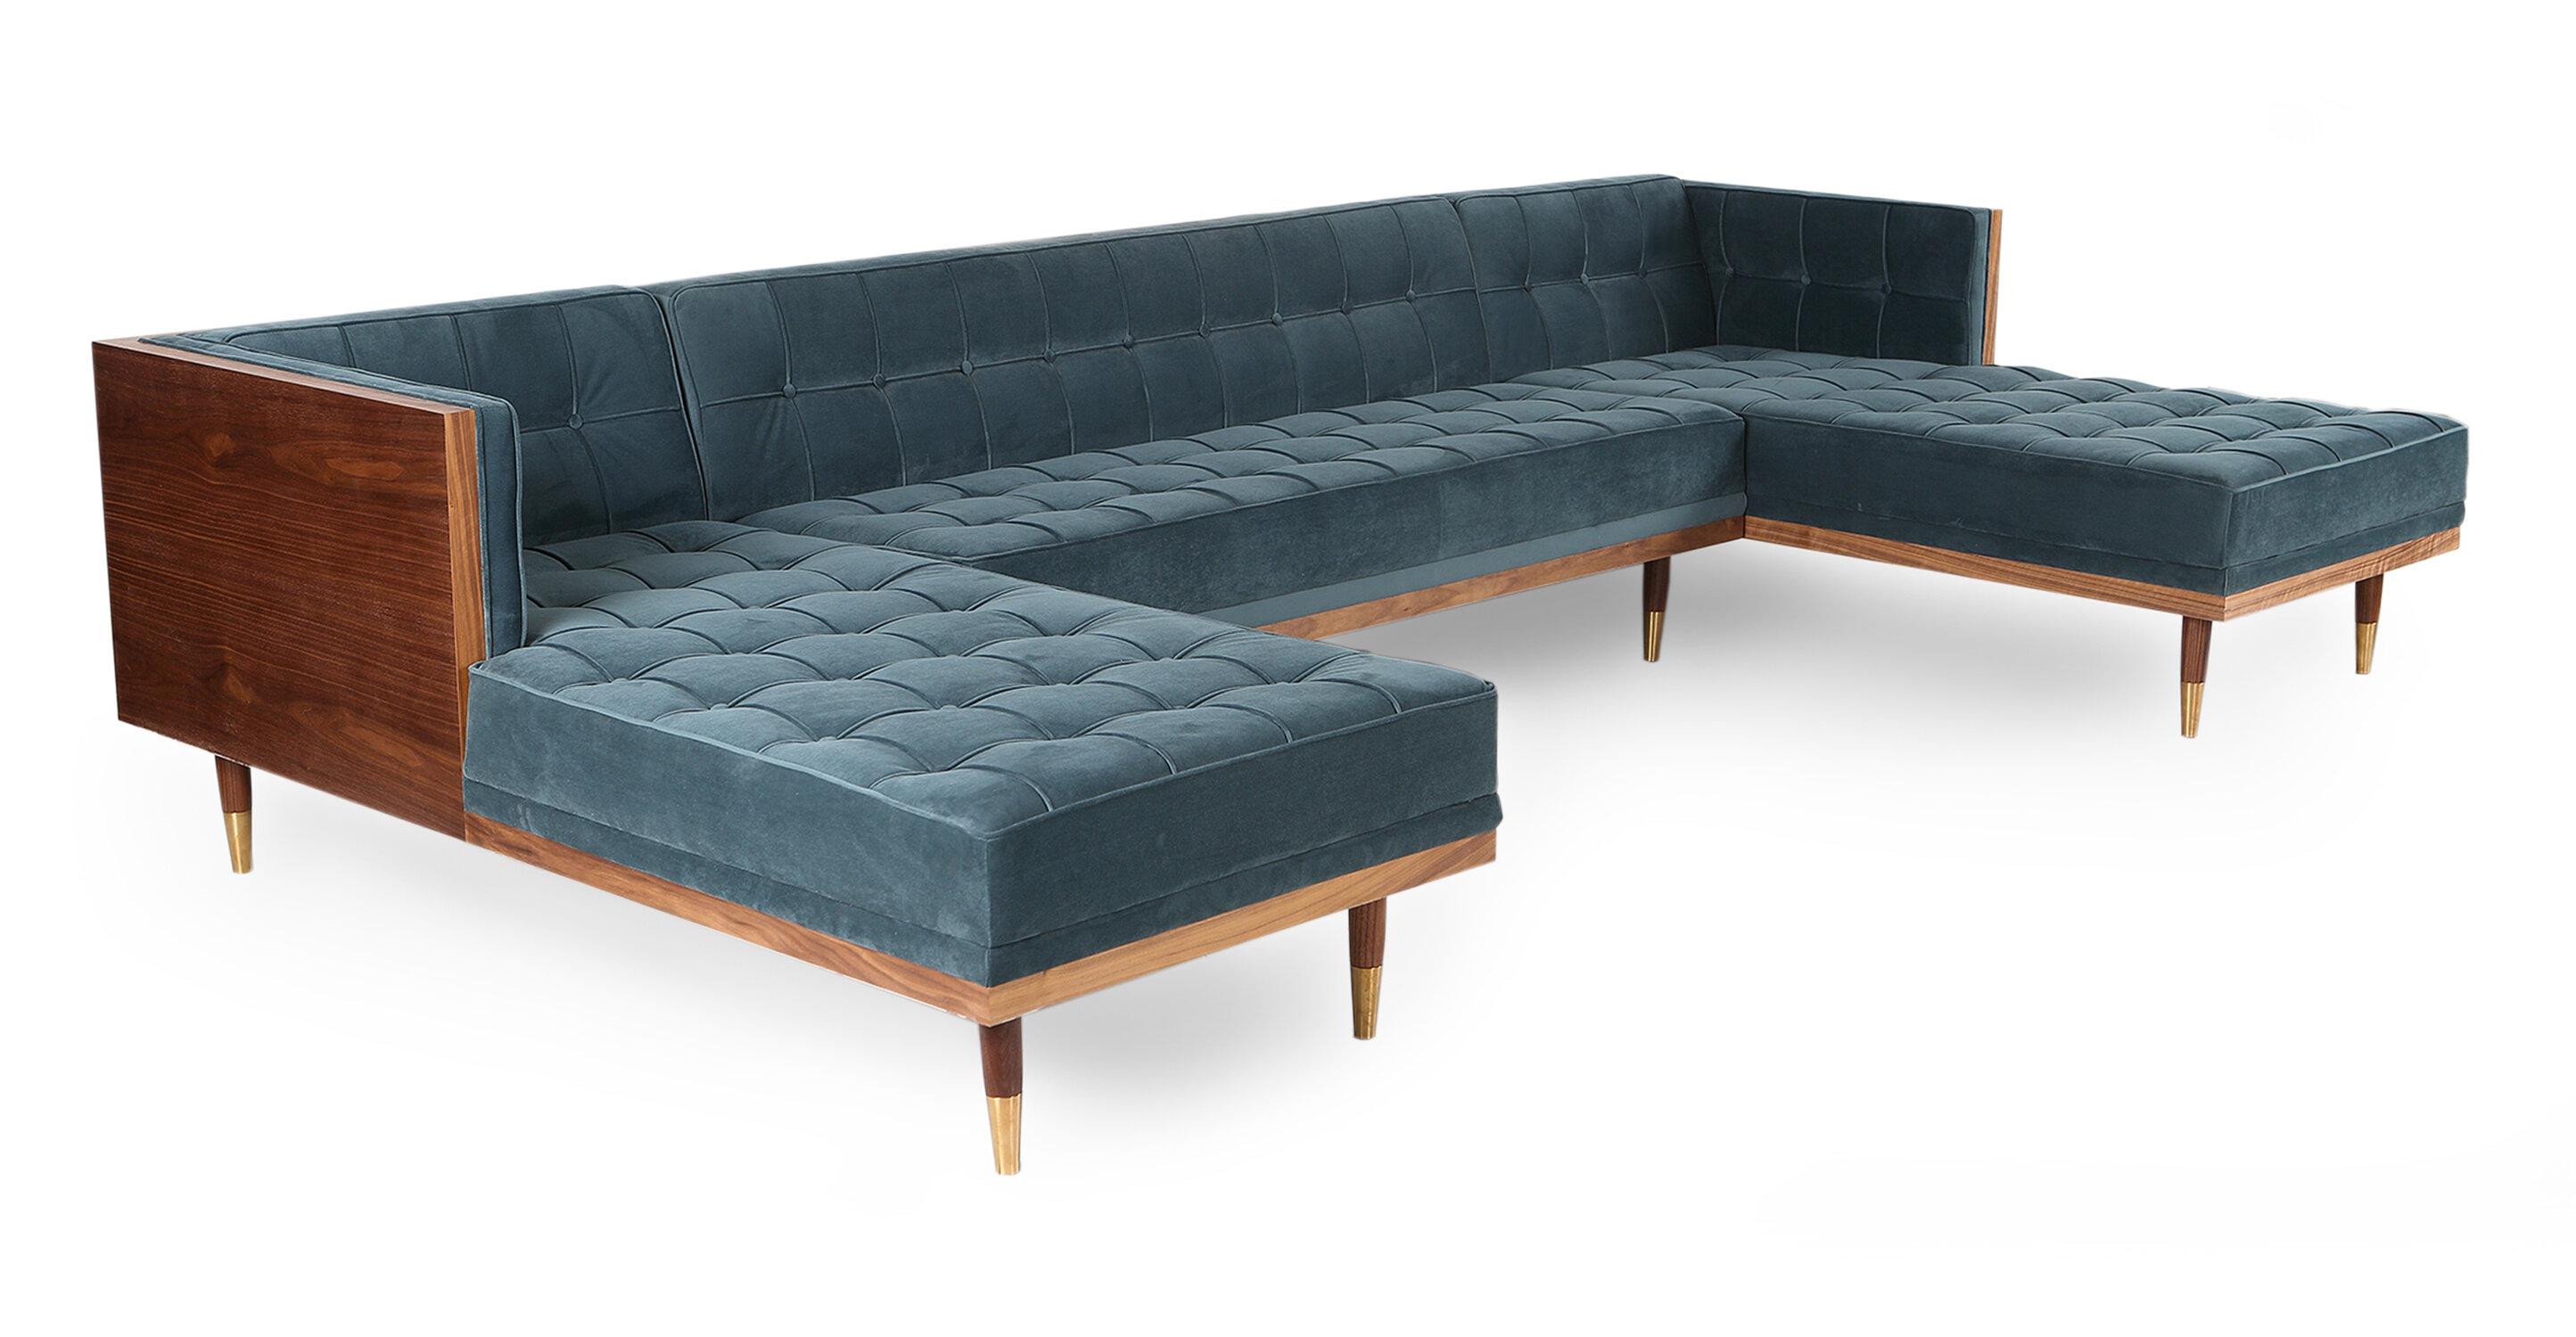 Remarkable Ledger Symmetrical Box Sofa U Shaped Symmetrical Modular Sectional Beatyapartments Chair Design Images Beatyapartmentscom